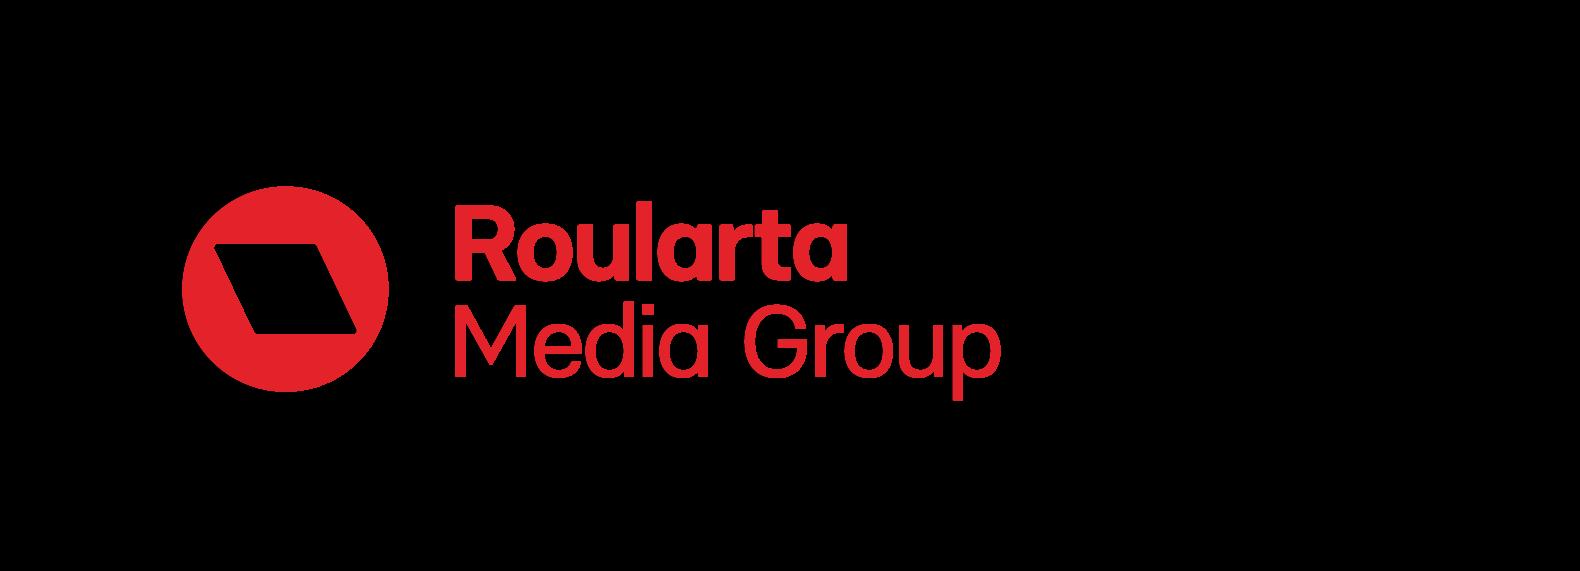 Roularta Media Group Logo RGB liggend